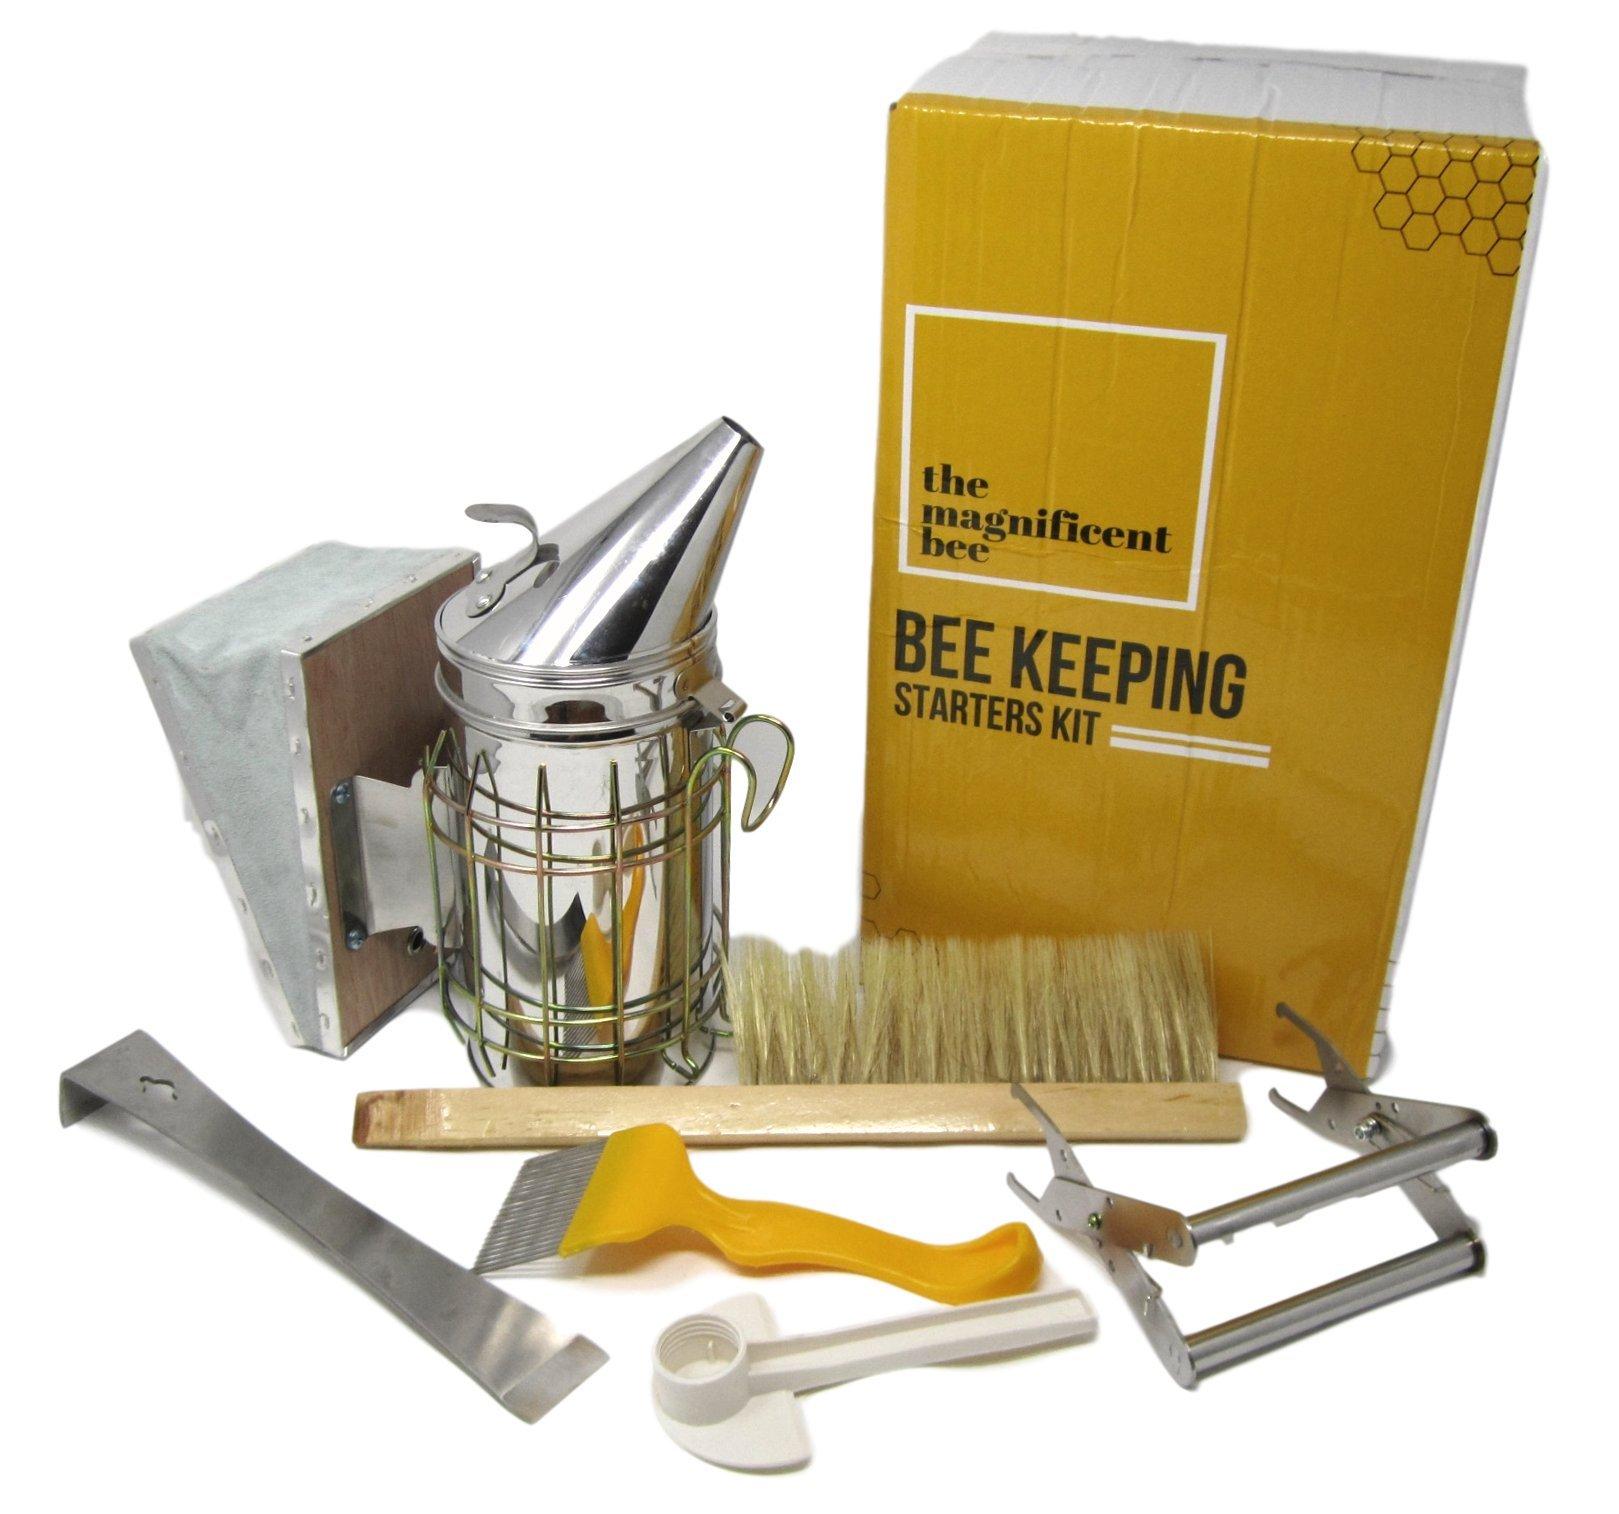 Premium Beekeeping Supplies Starters Kit | 6 Piece Tool Set | Includes Bee Hive Smoker, Uncapping Fork Tool, Bee Brush, Frame Grip, Extracting Scraper, Bee Feeder Tool